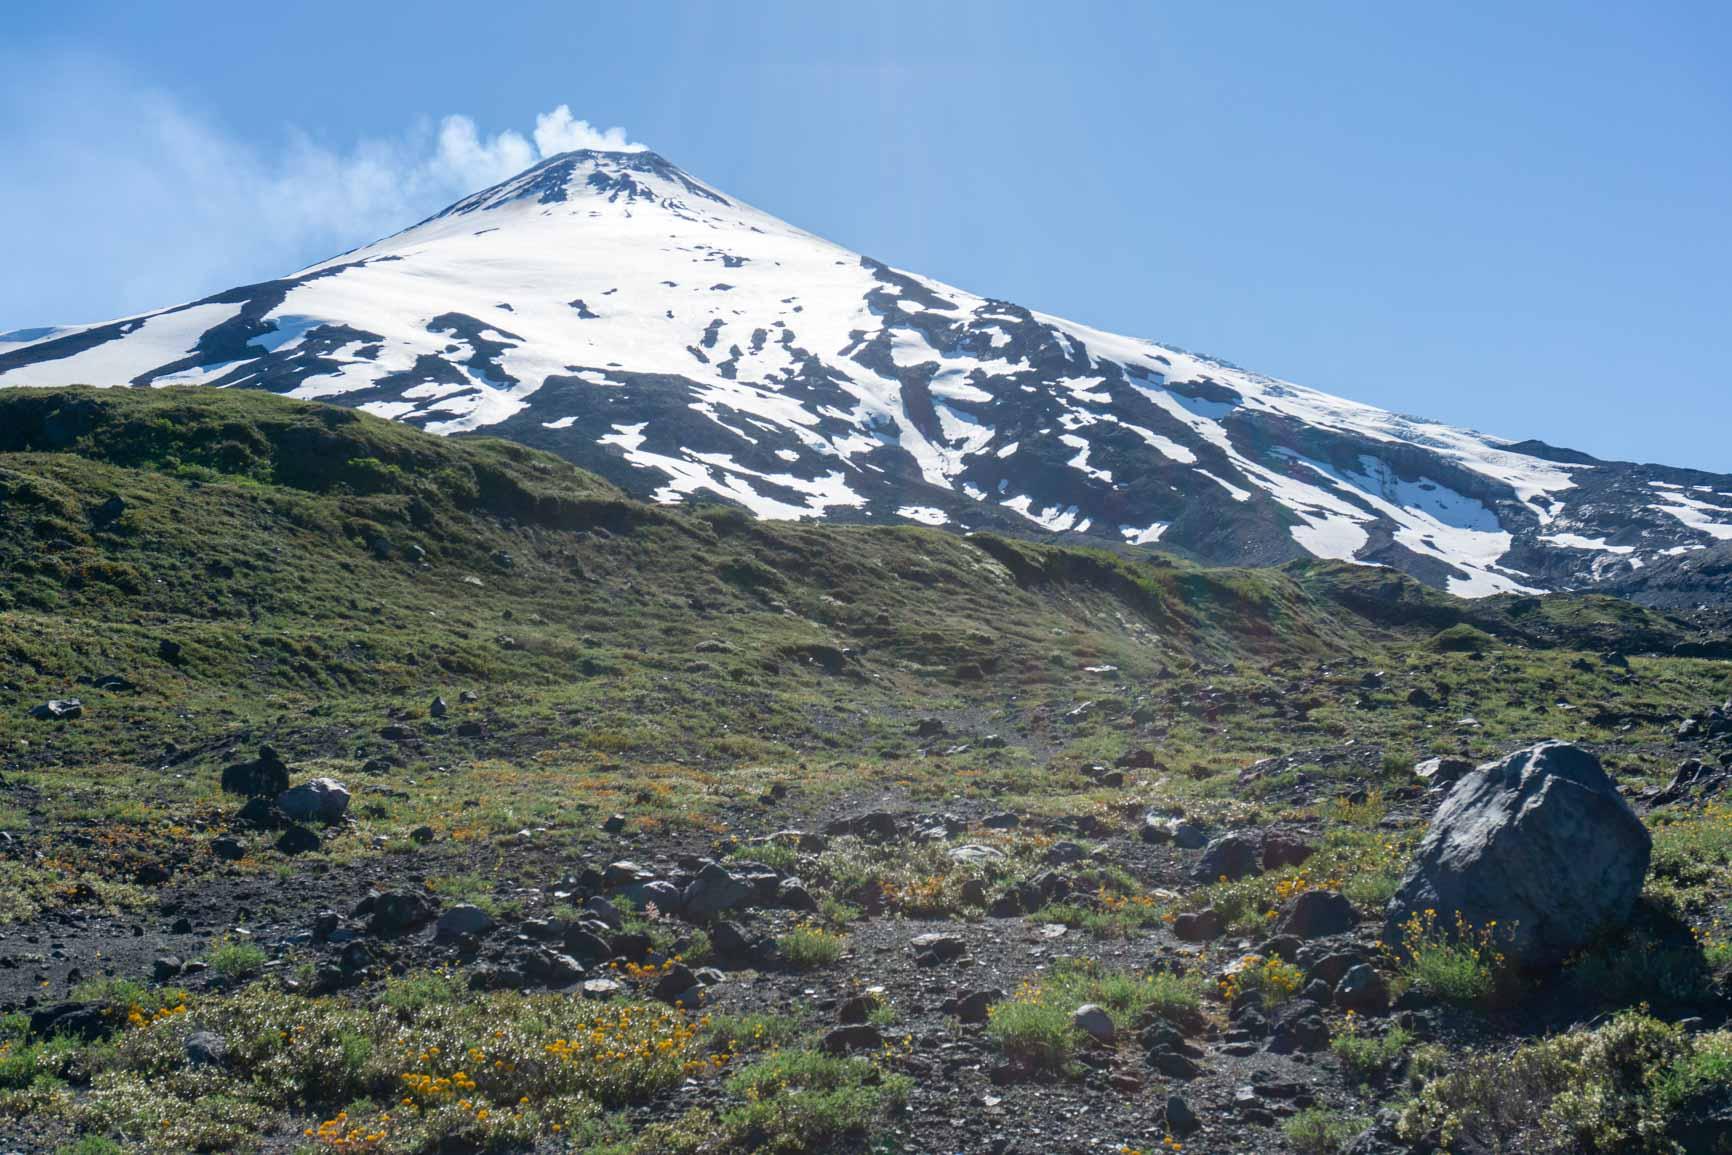 Patagonia_Chile_Pucon_Parque Nacional Villarrica